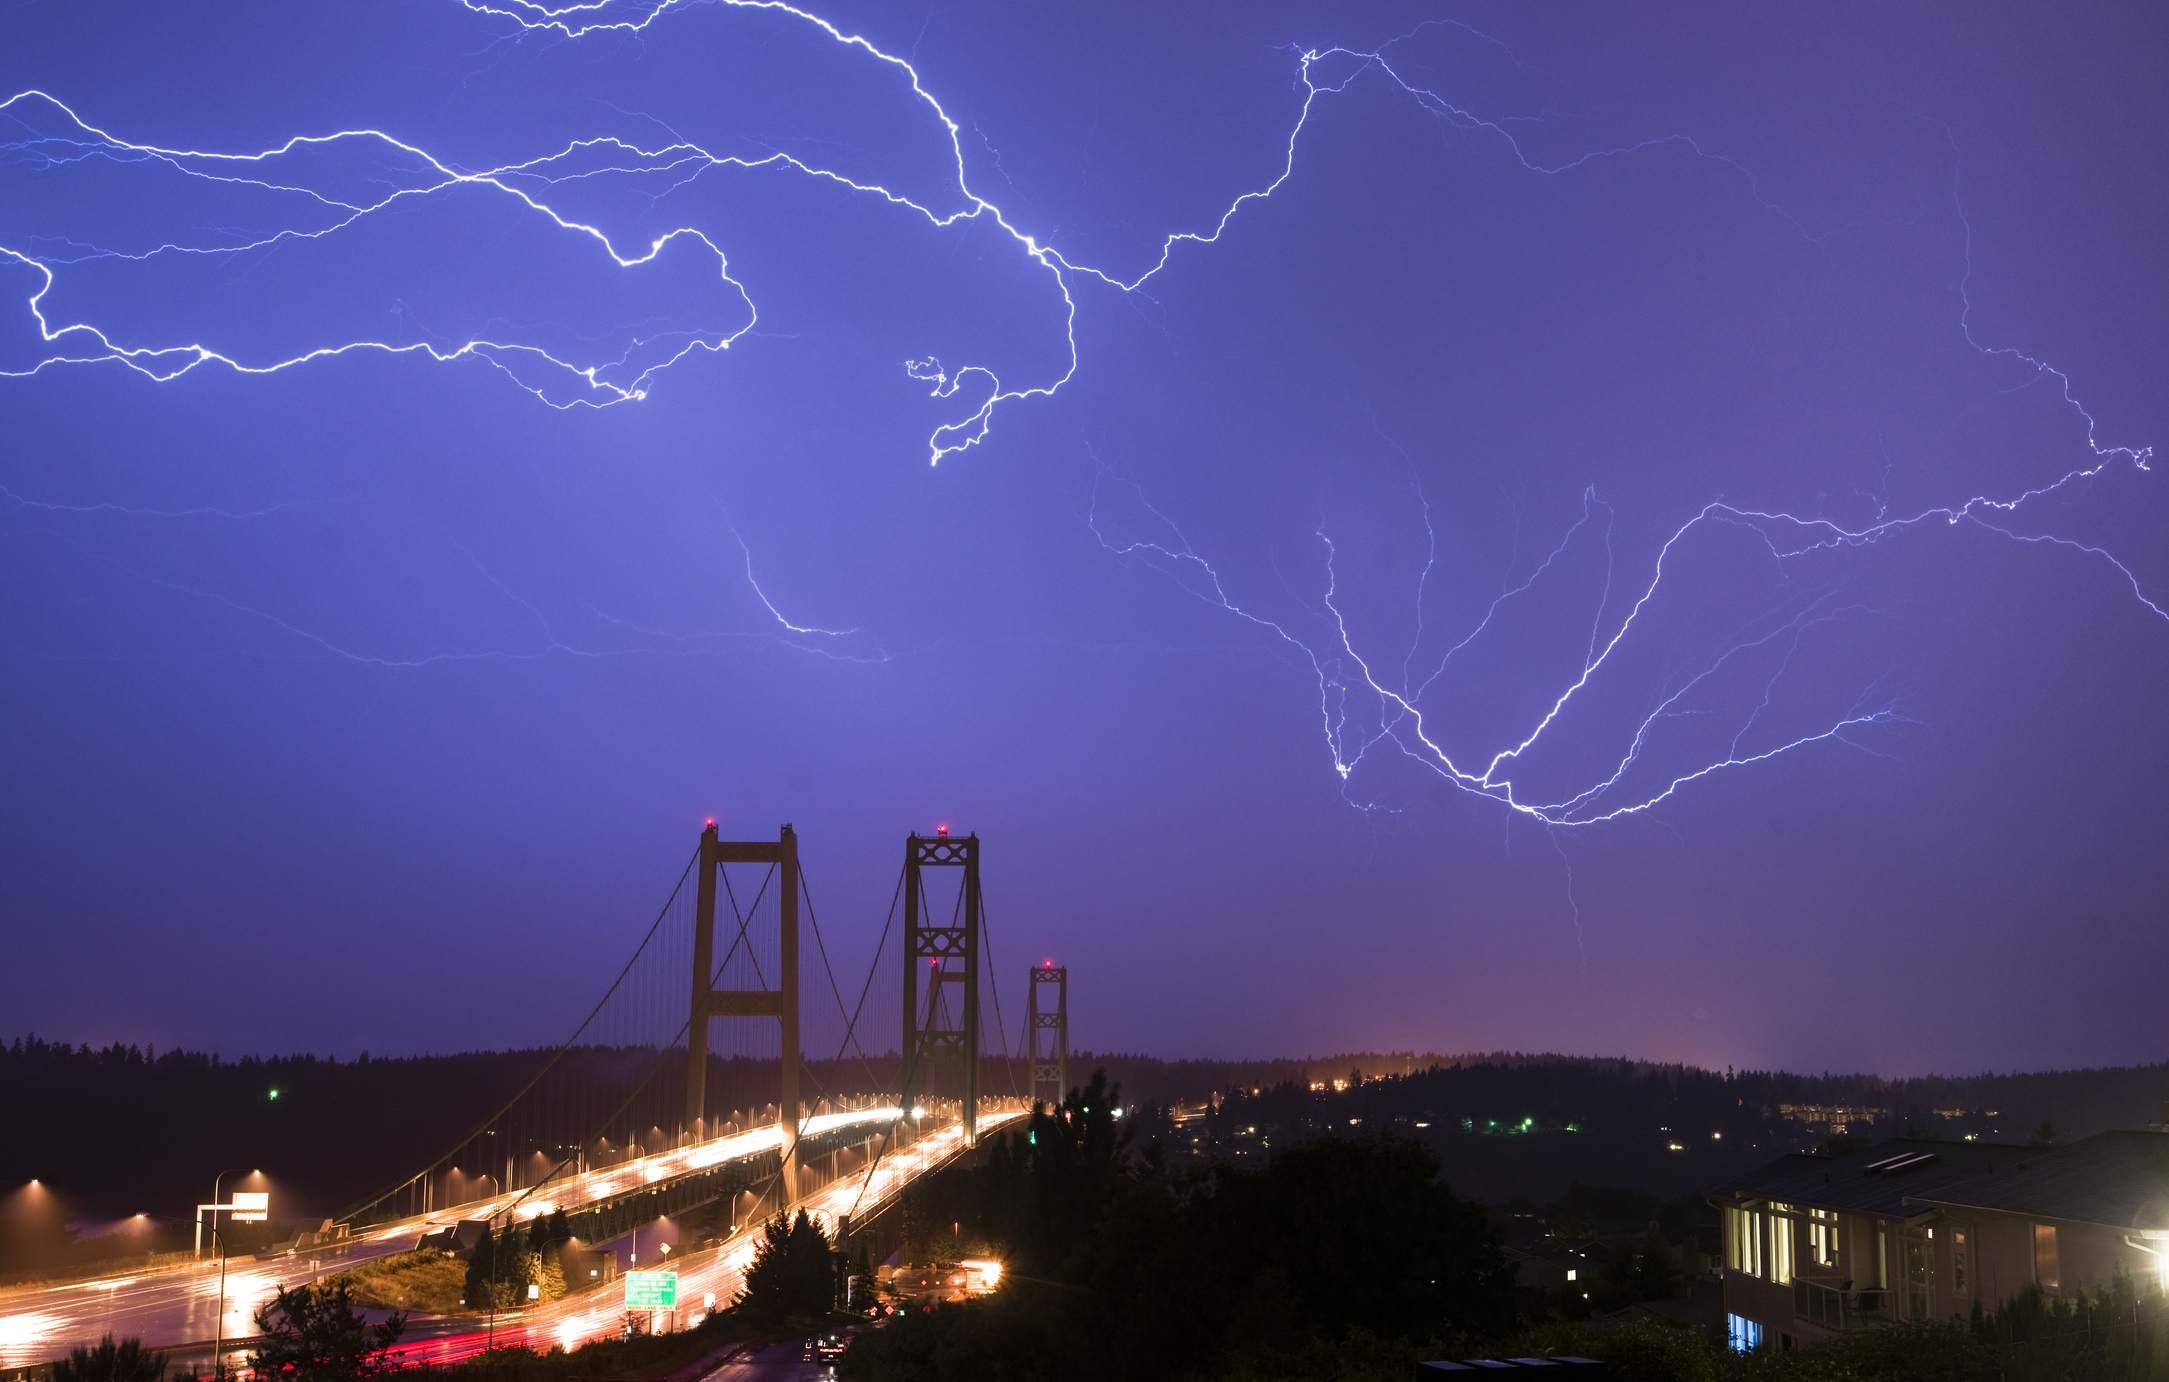 Electrical Storm Lightning Strikes Bolts Tacoma Narrows Bridge W